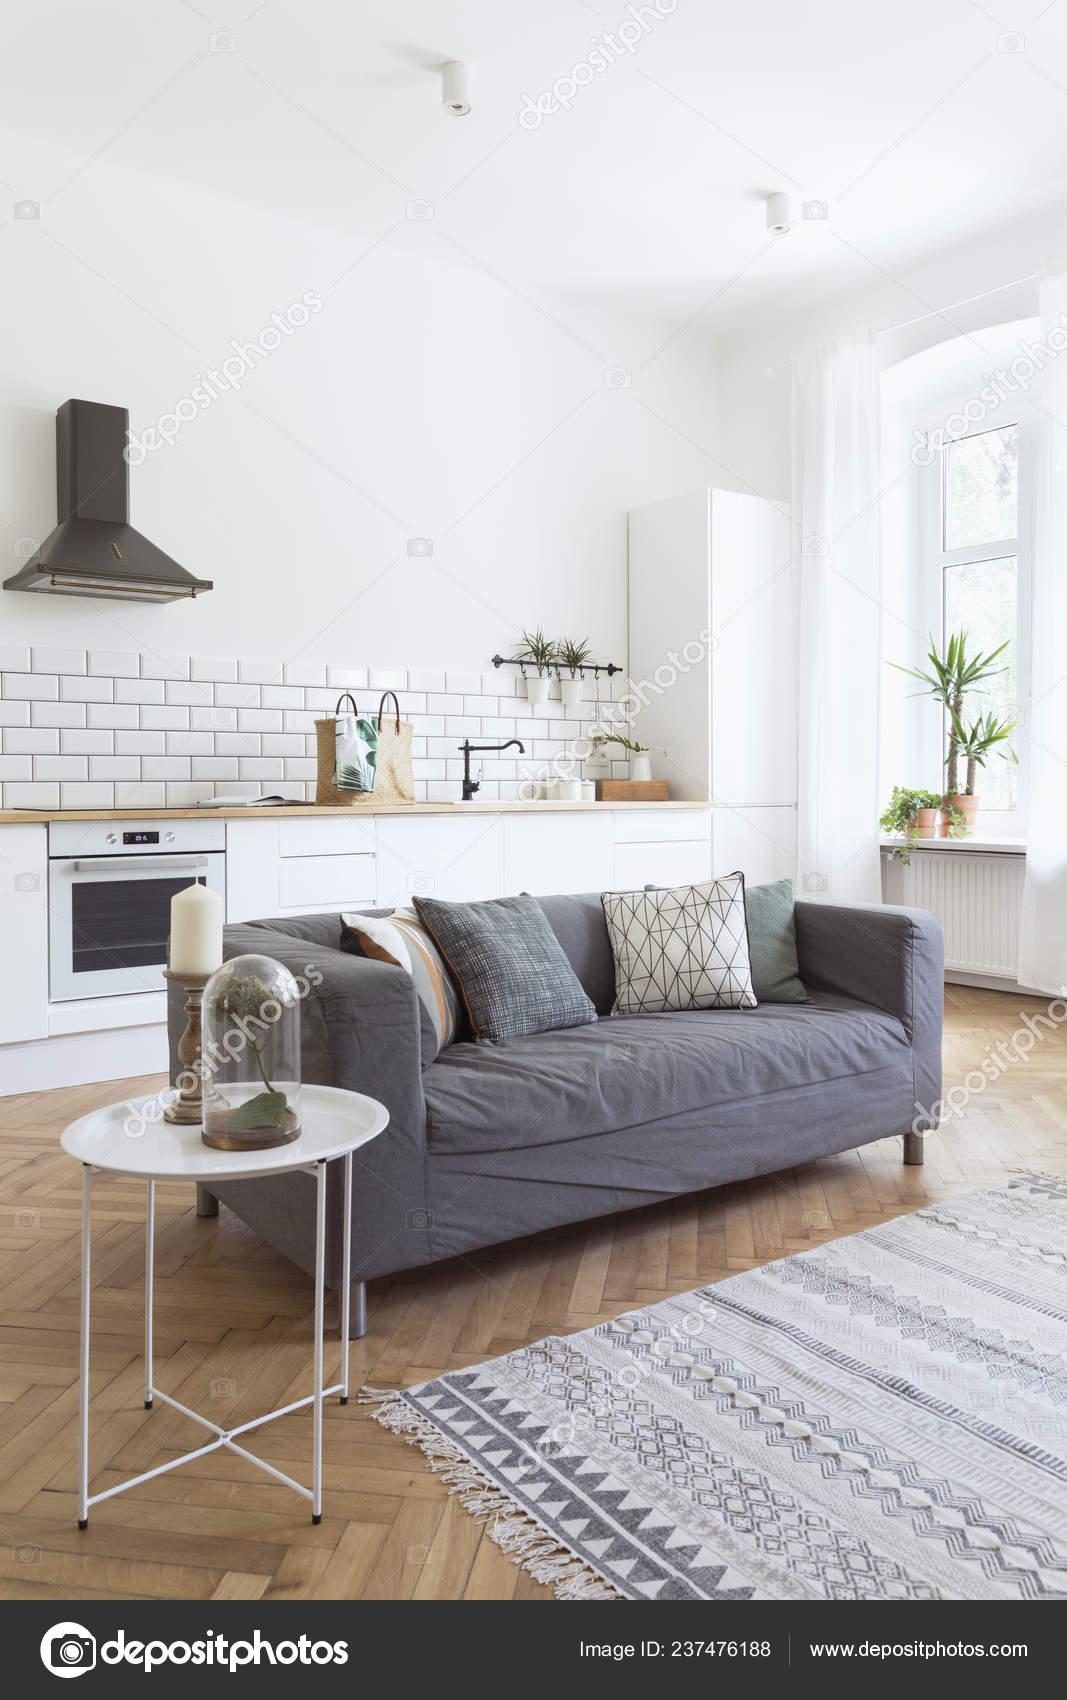 Modern Open Interior Living Room Kitchen Stylish Sofa Plant White Stock Photo C Followtheflow 237476188